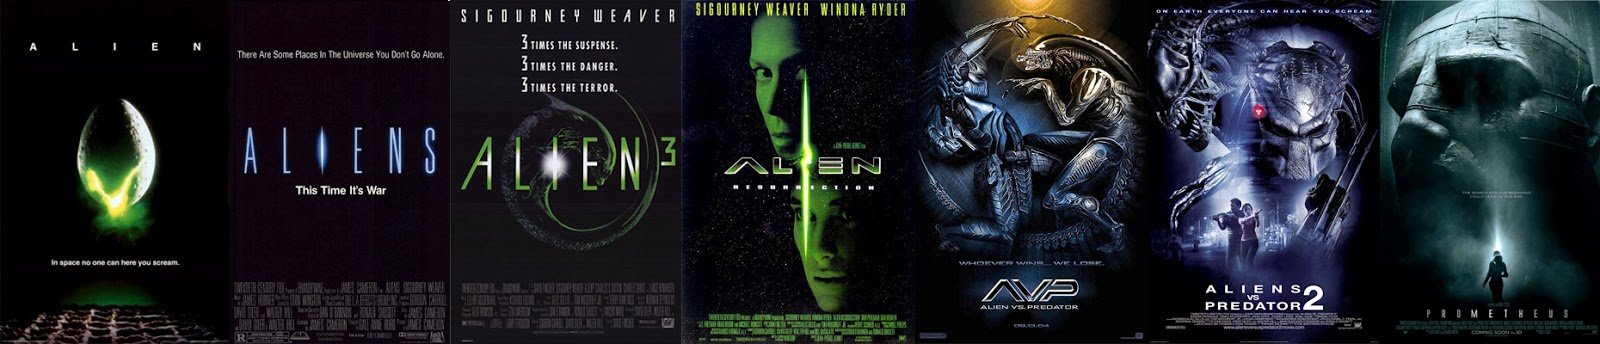 Remake, Reboot, Sequel, Prequel, czyli dzisiejszy repertuar kin